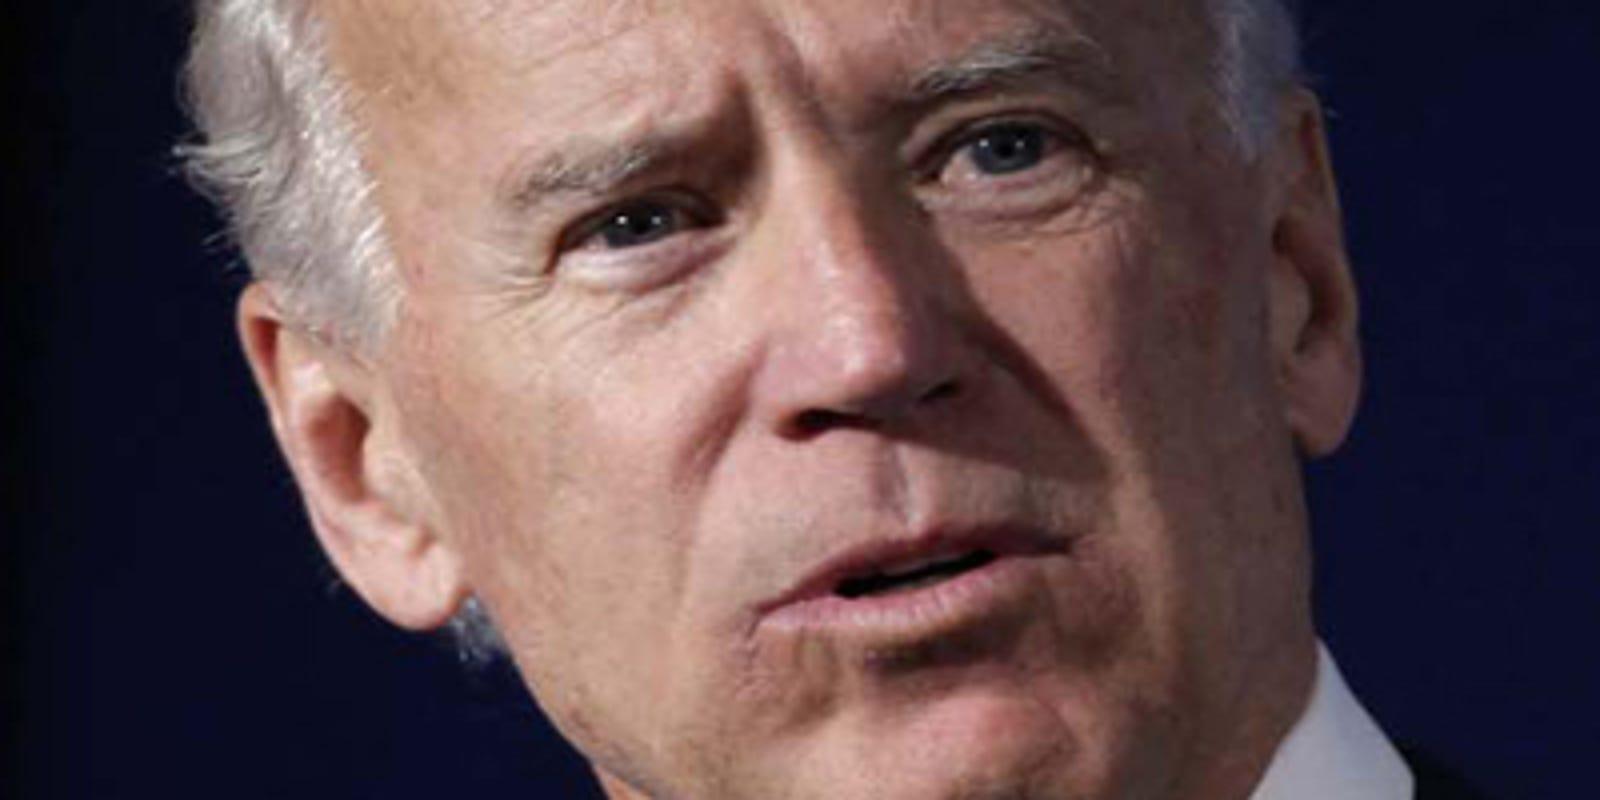 What happened to 'Honest Joe'? President Joe Biden's promises are turning into lies.